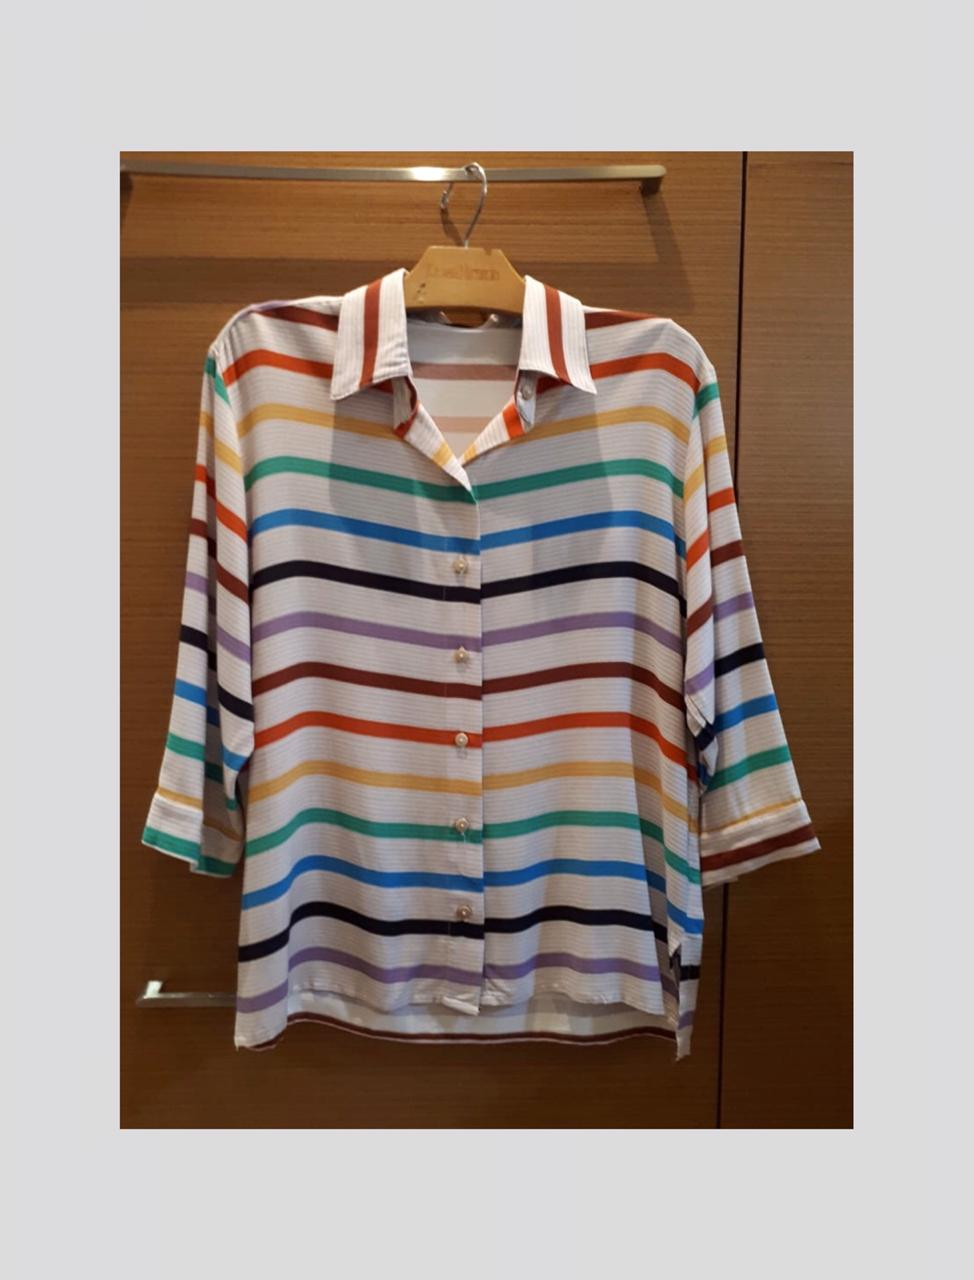 Camisa viscose listras coloridas